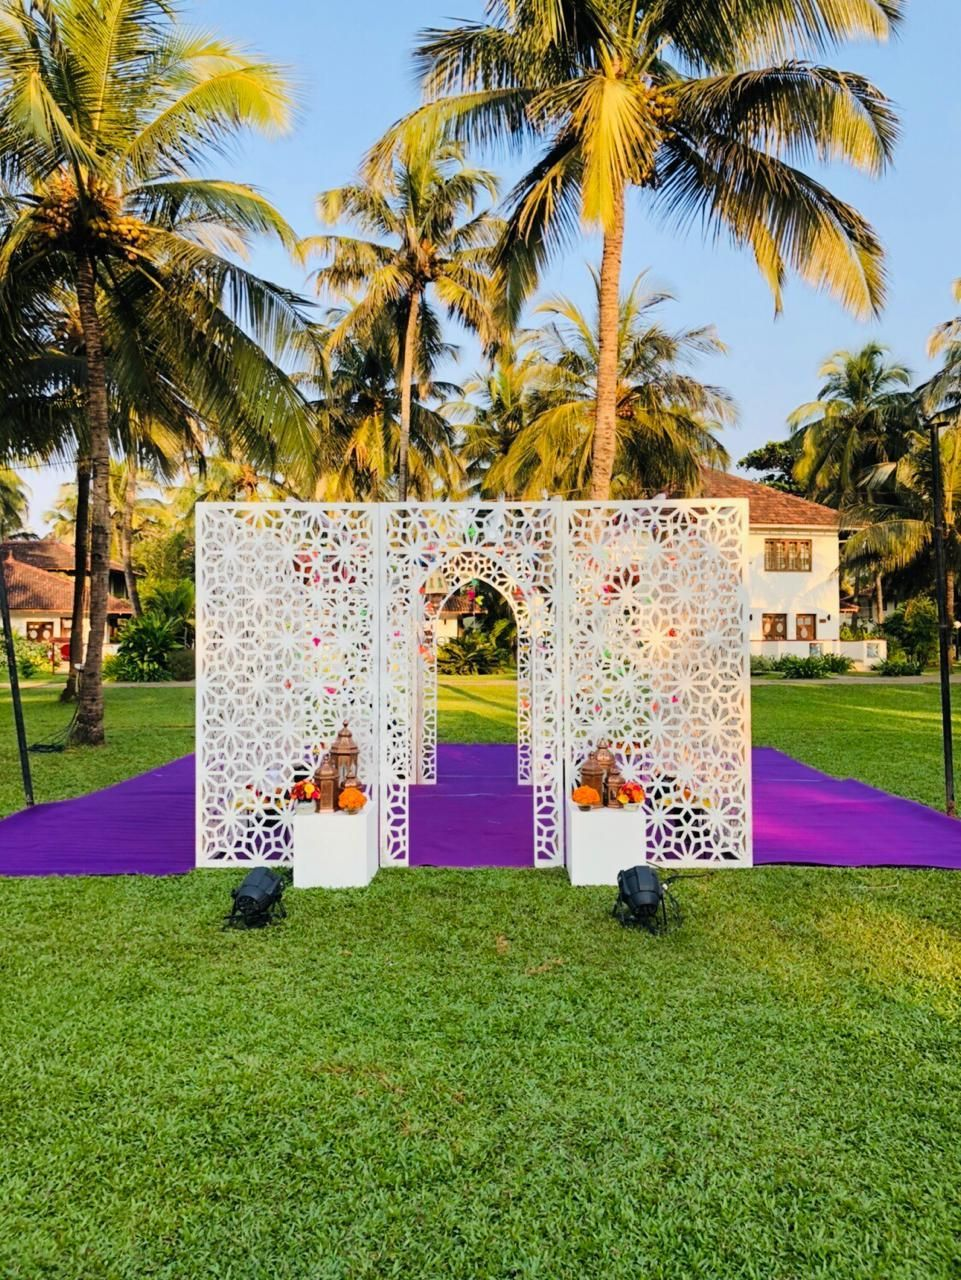 Photo From Hemali and Shiv - By Weddings by Garema Kumar